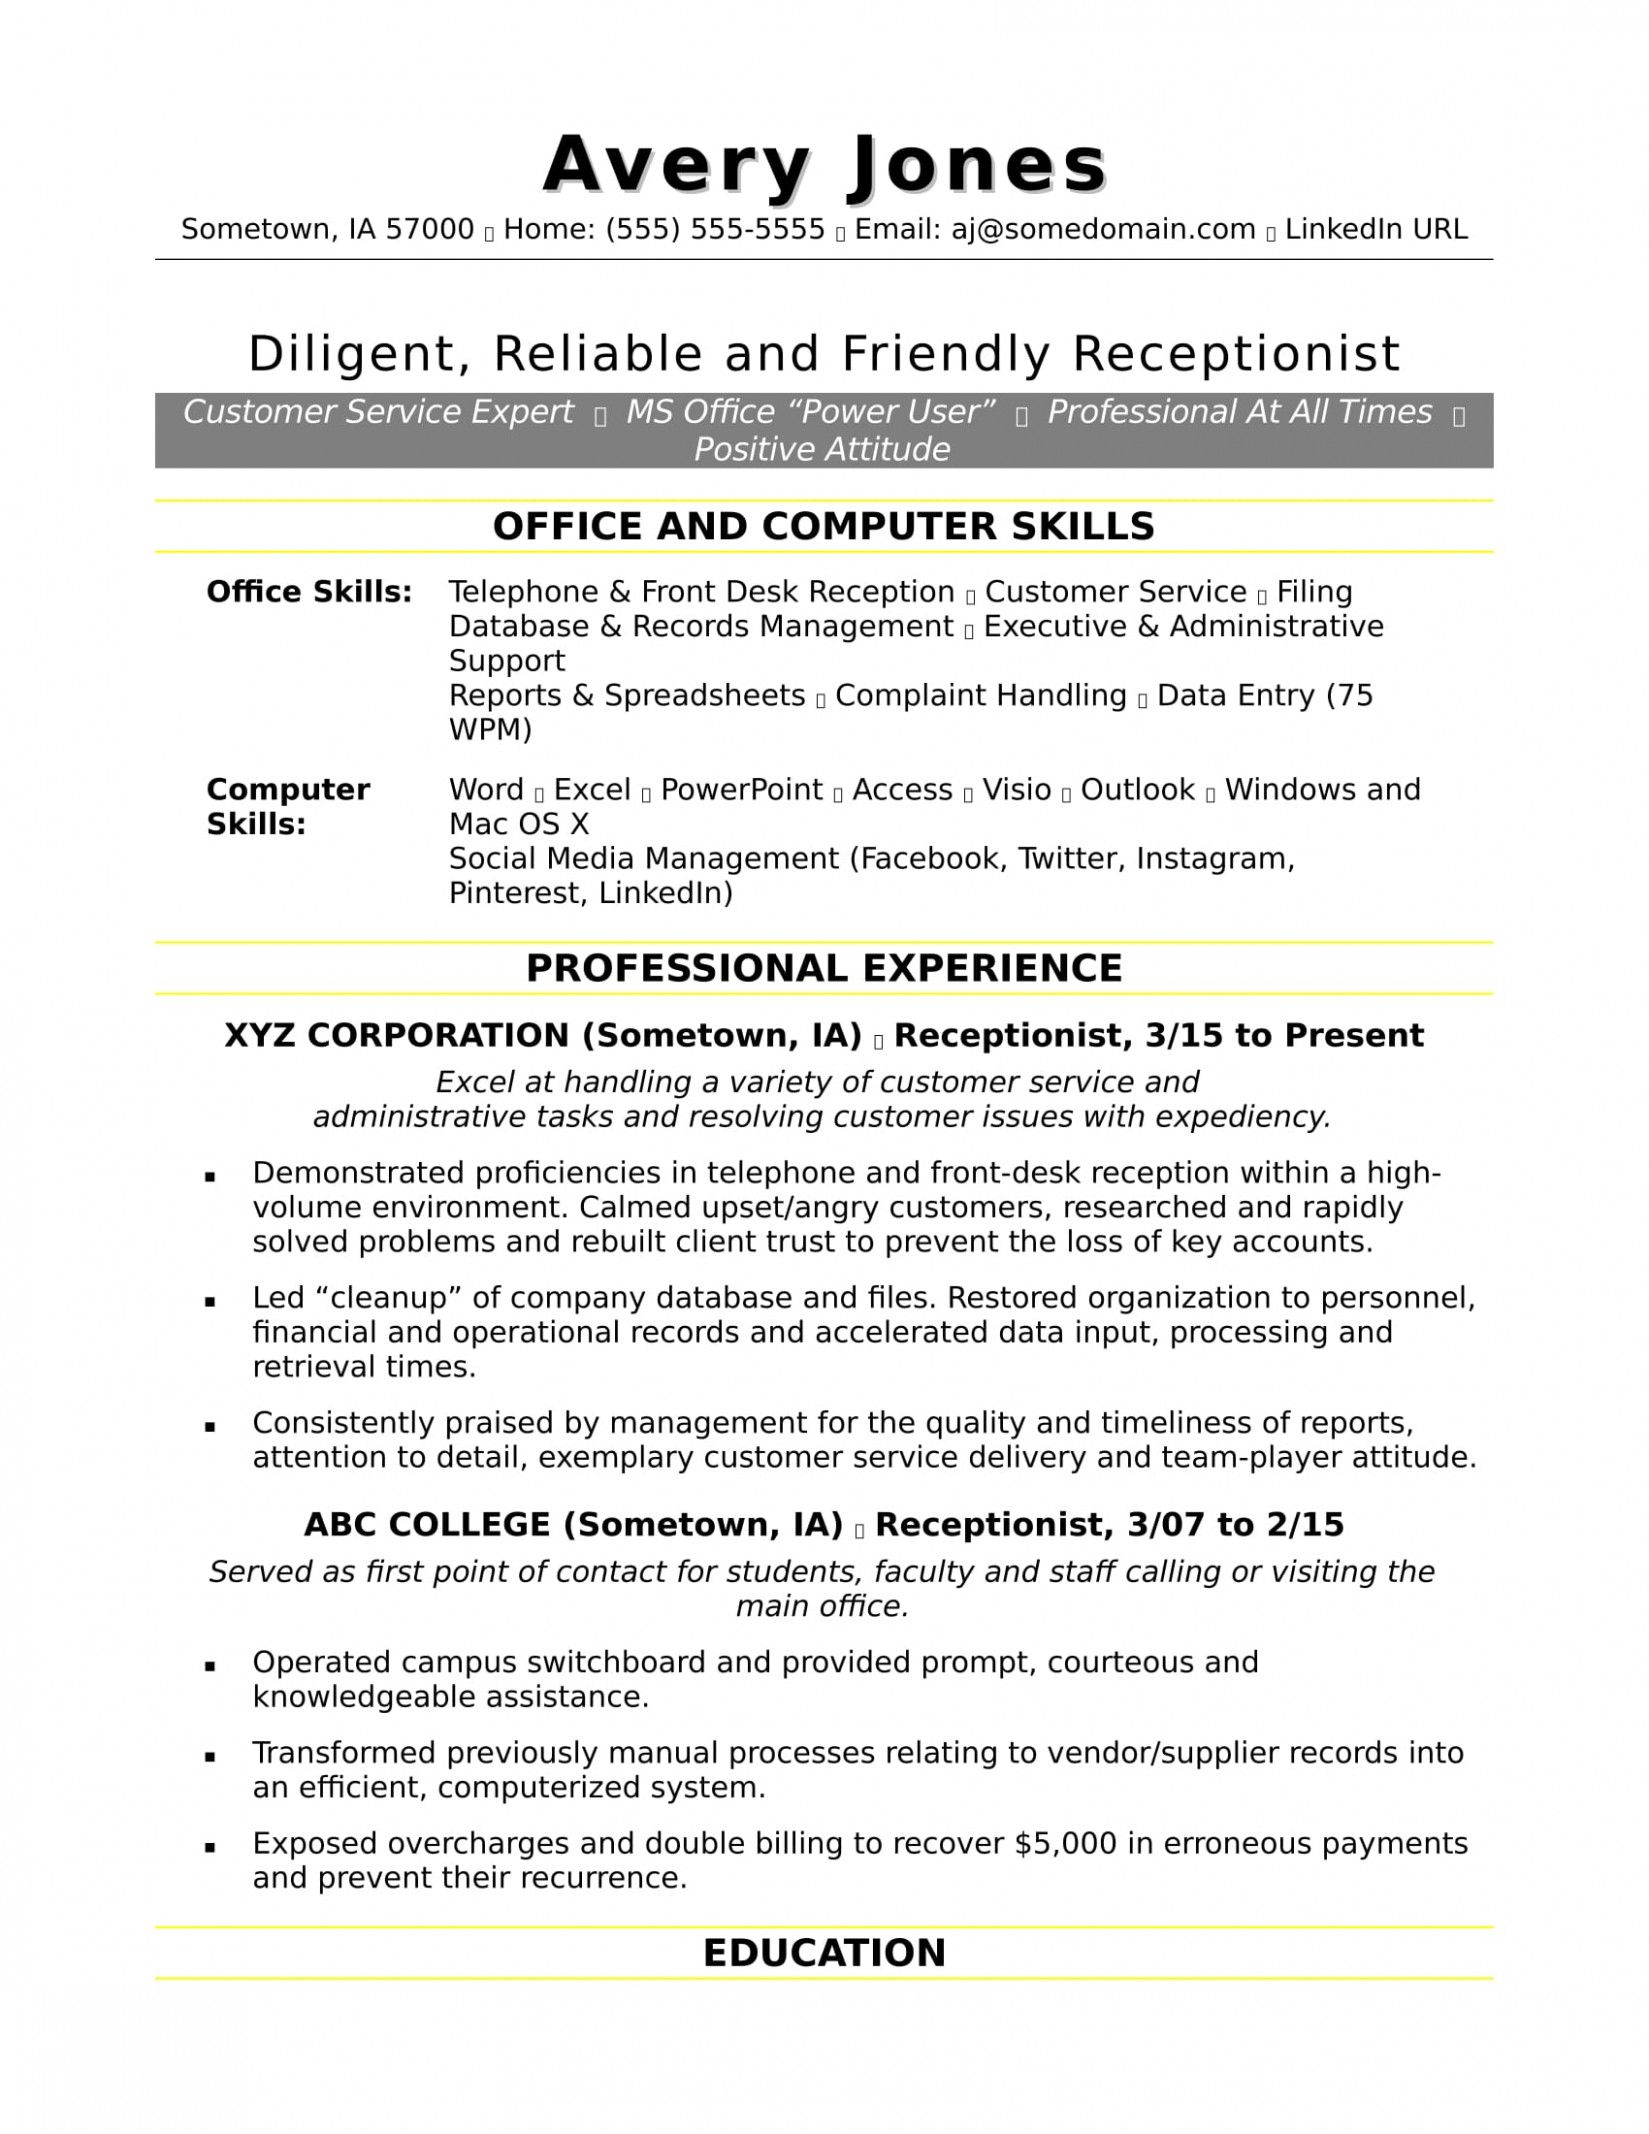 14 Basic Computer Skills Description For Resume Resume Examples Resume Skills Resume Profile